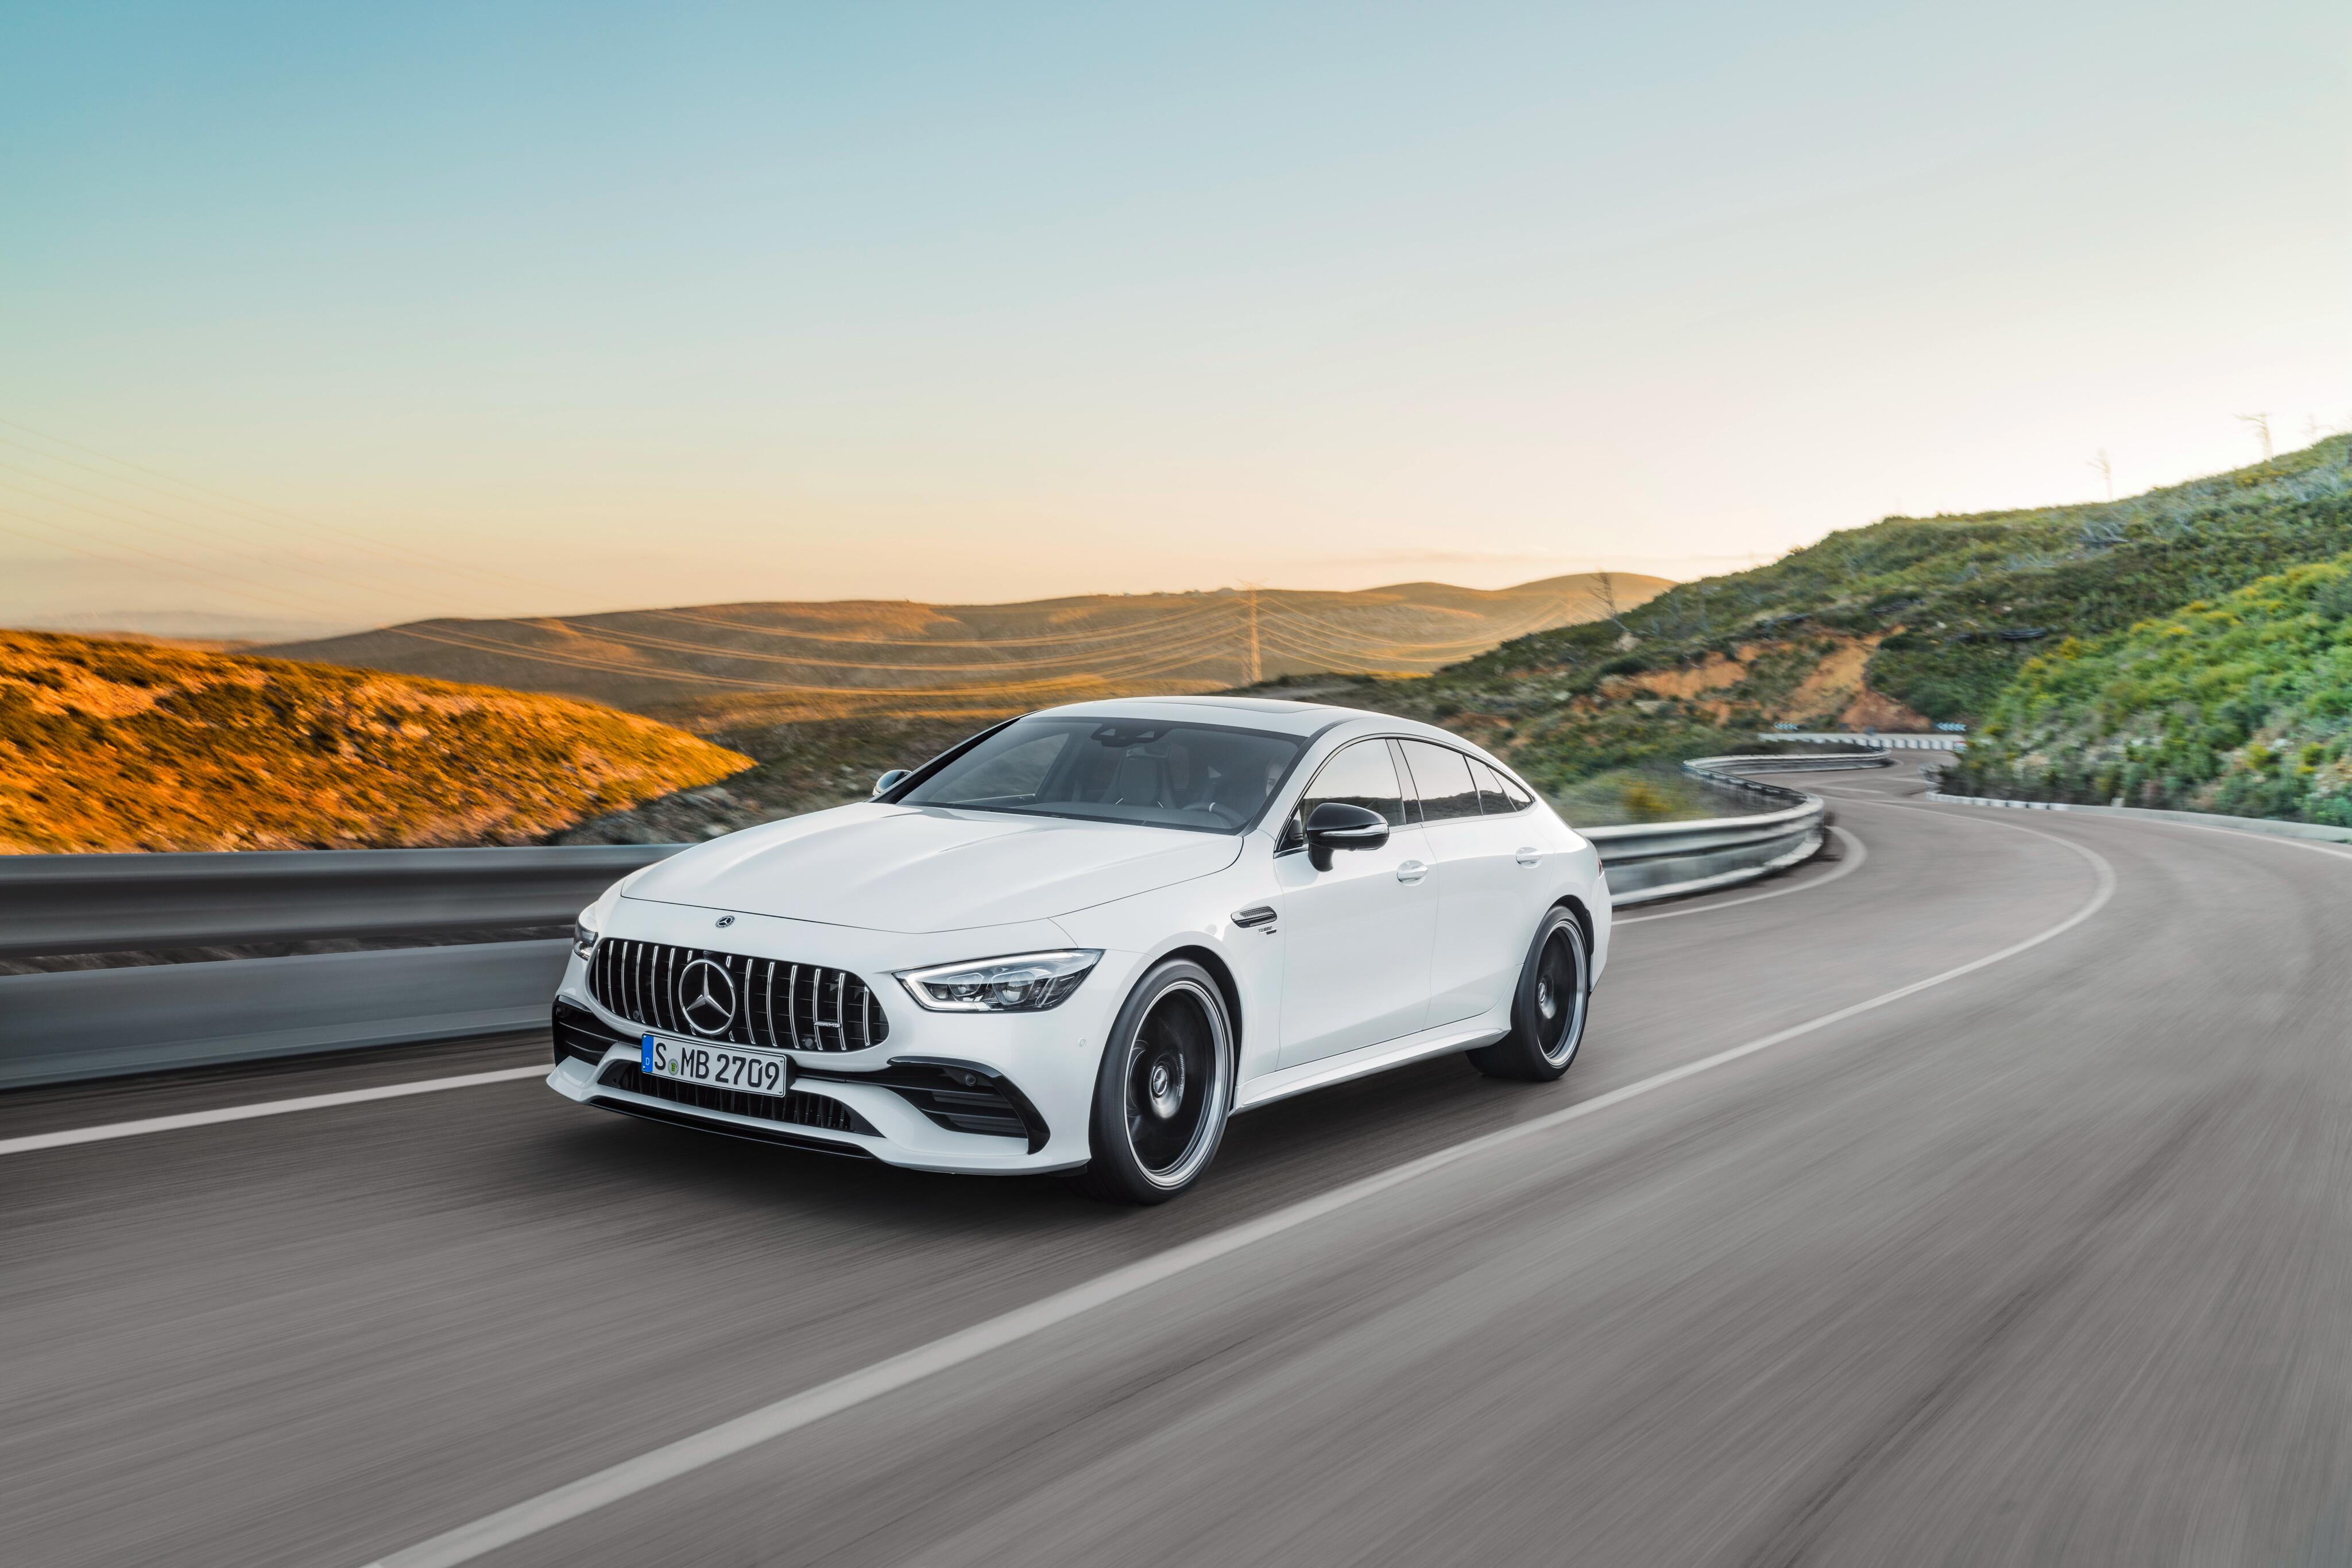 Mercedes-AMG GT53 4MATIC